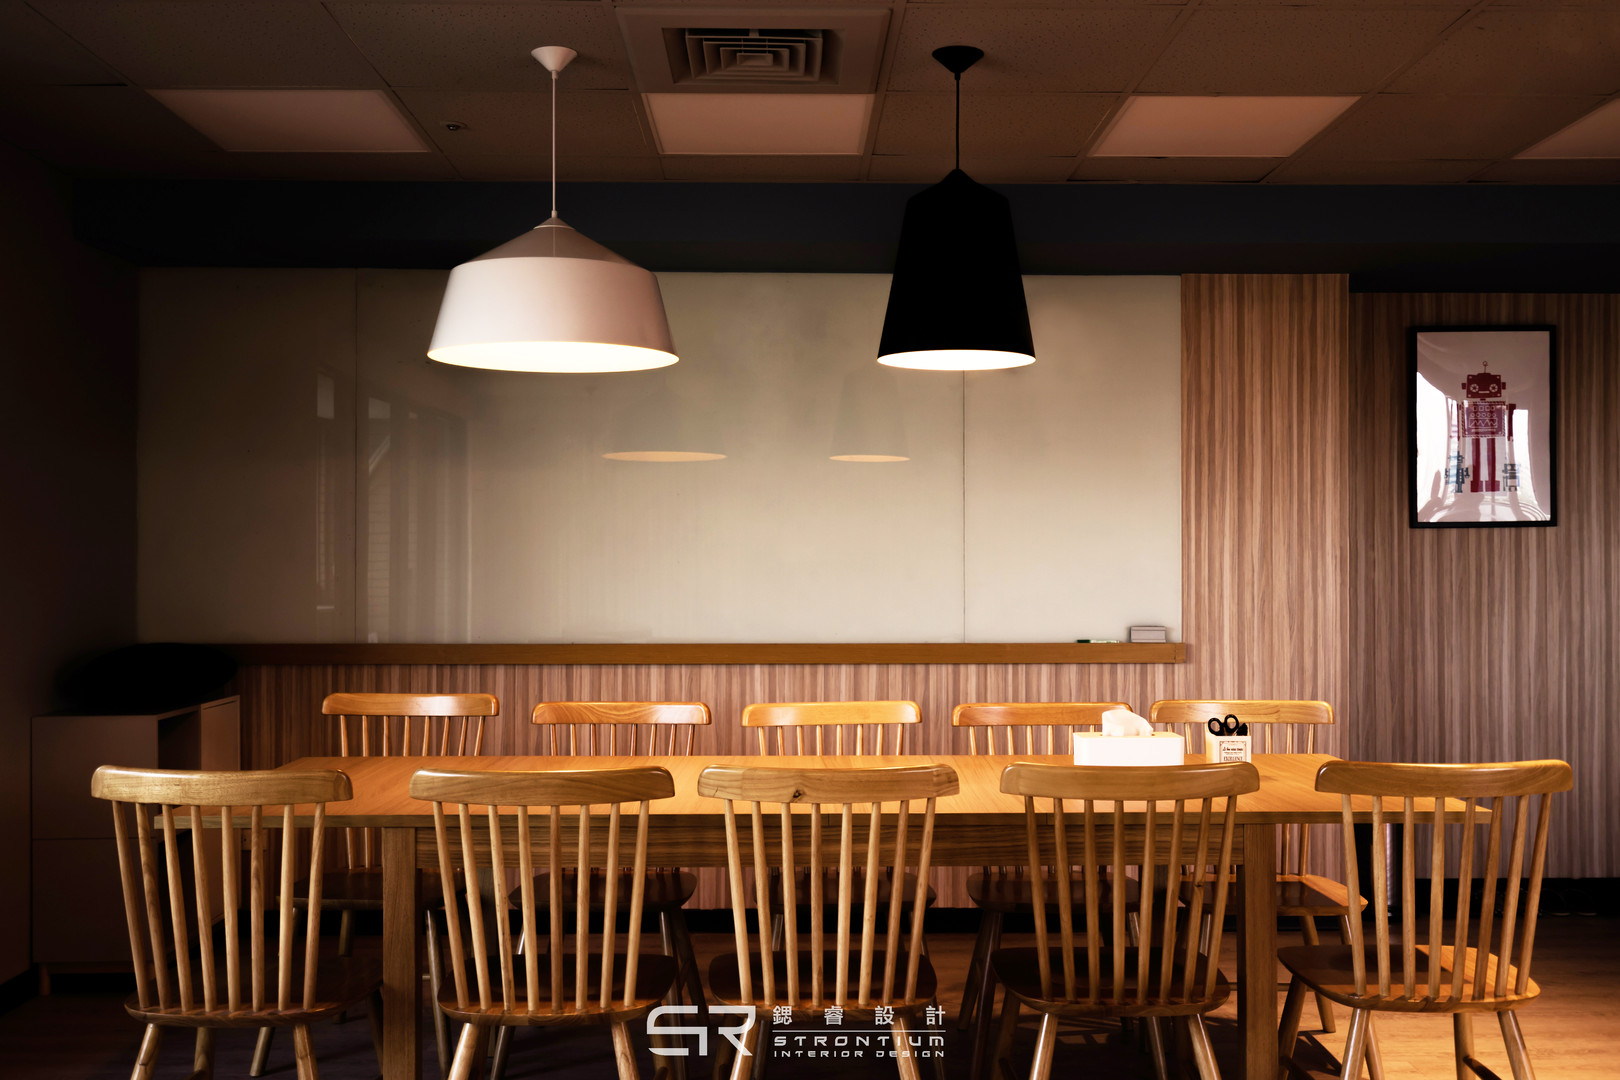 SR-Mtech-cafe-01.jpg